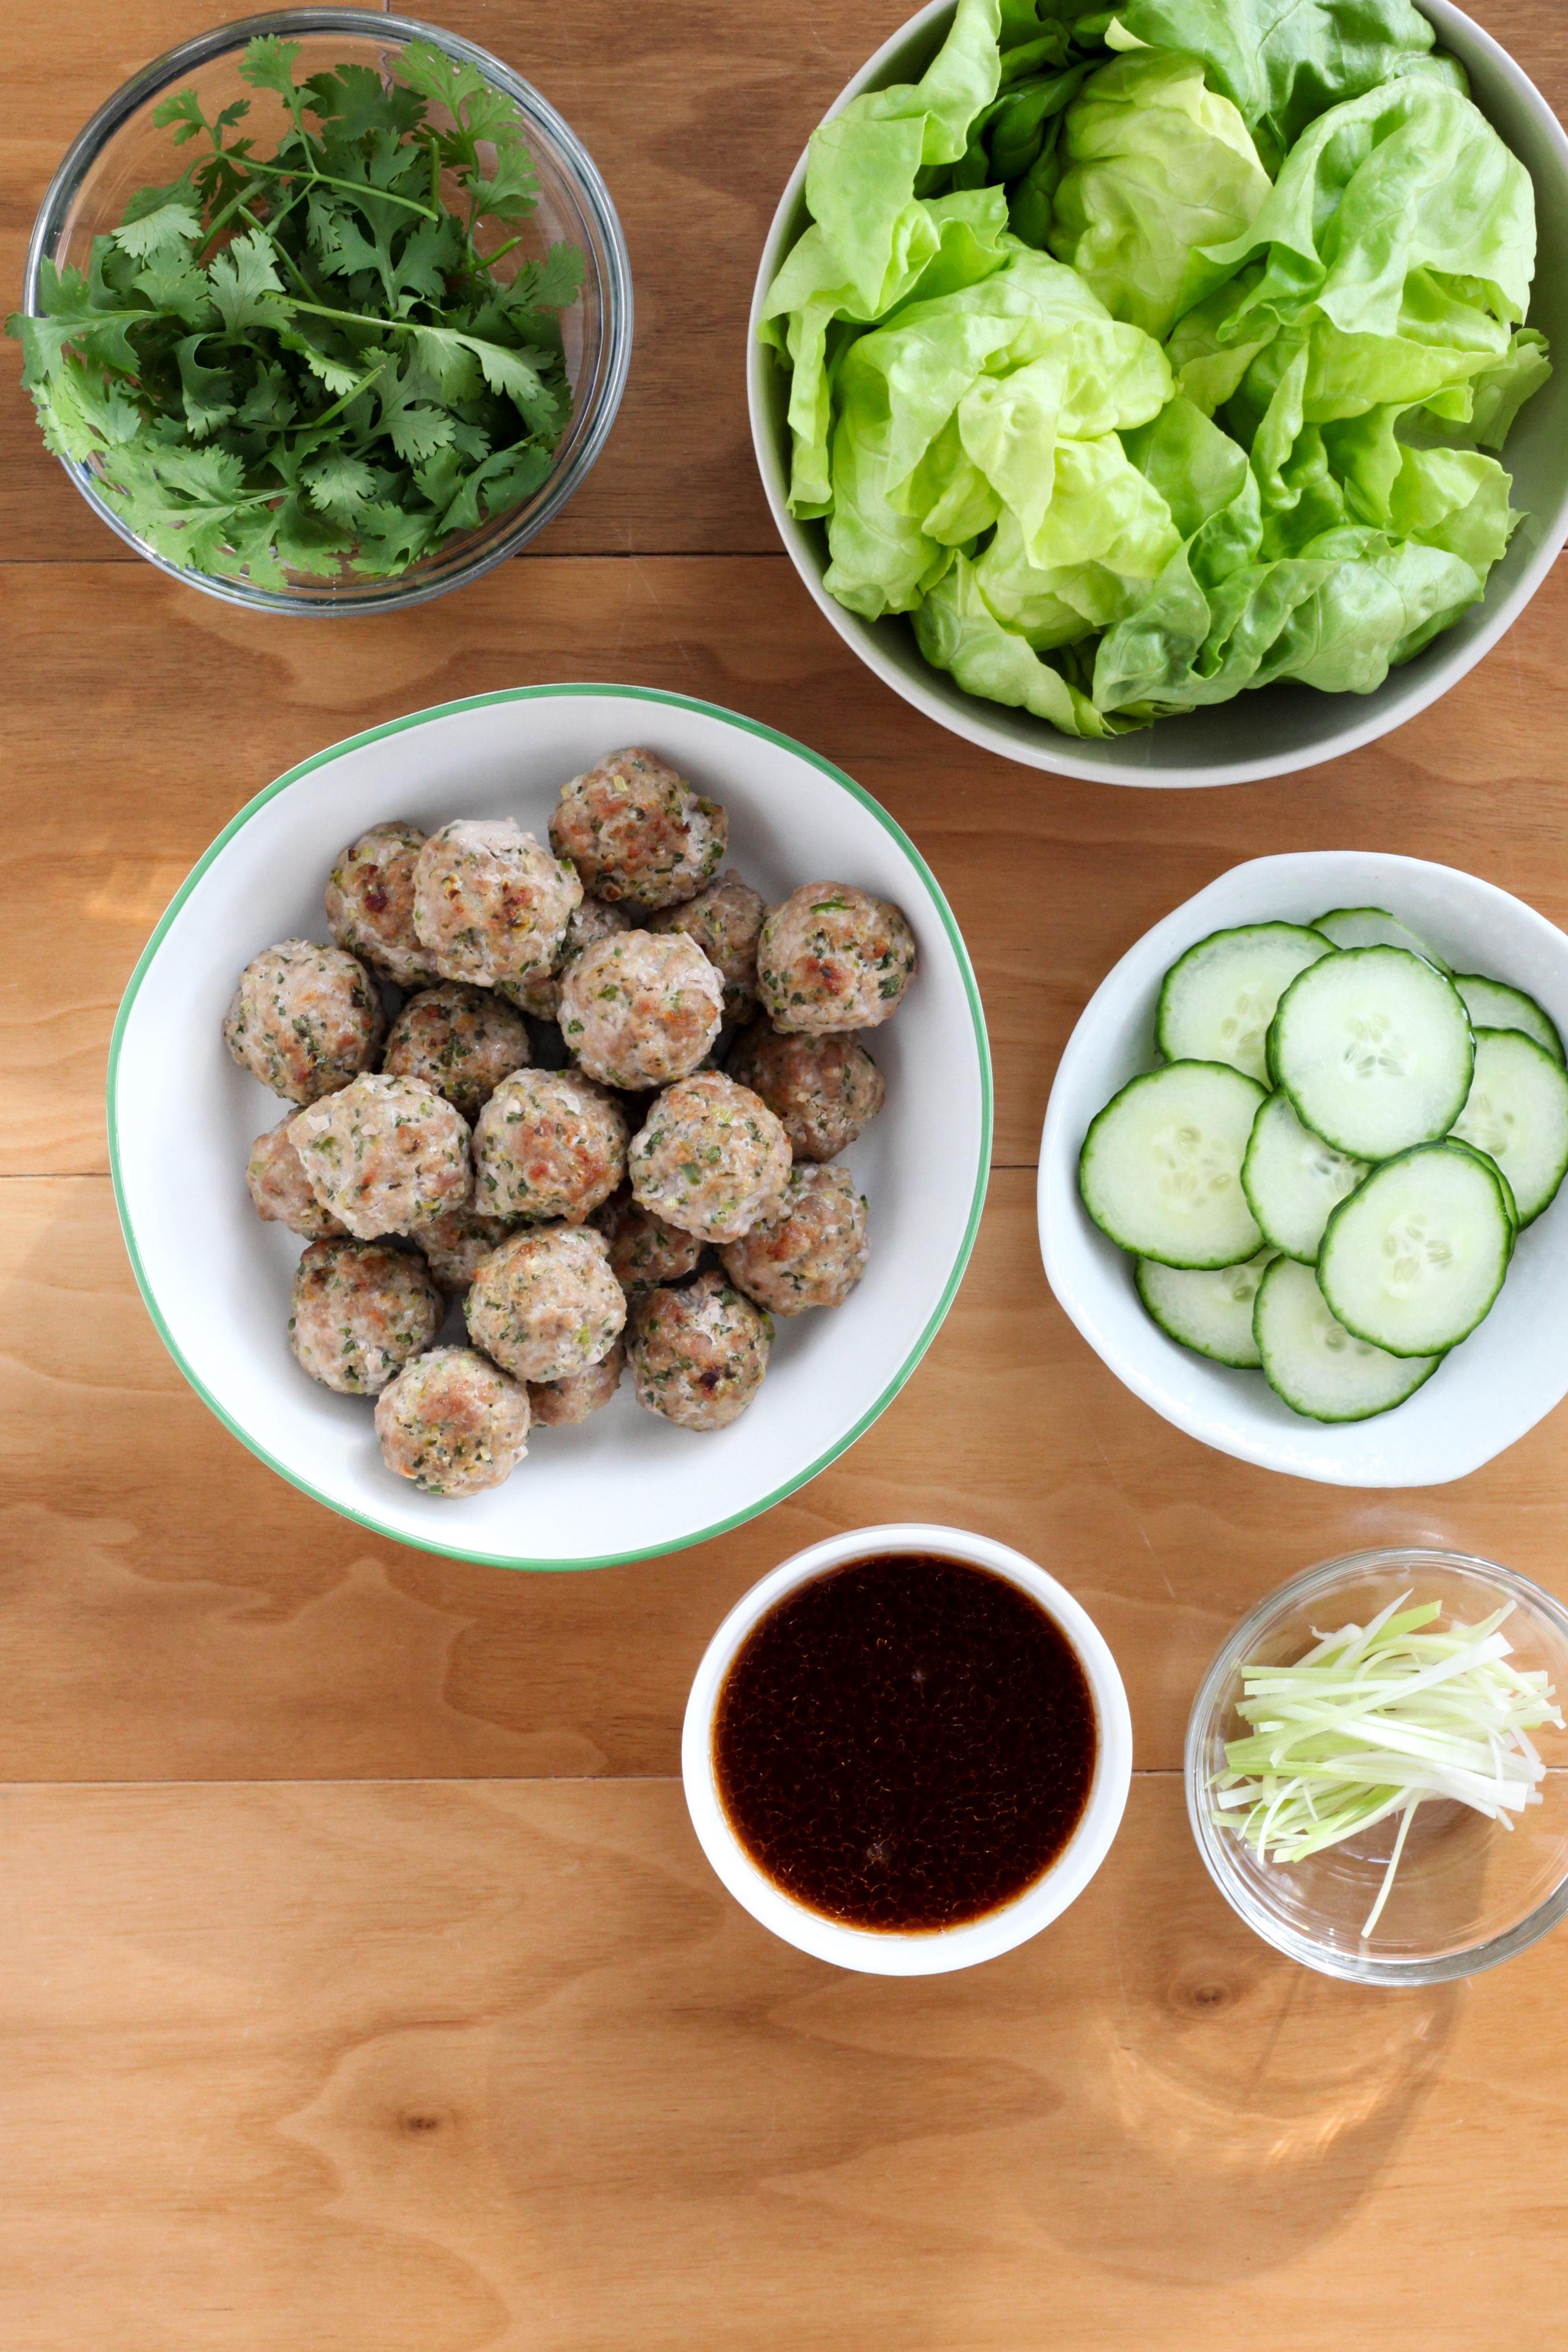 Ginger Pork Meatball Lettuce Wraps With Cilantro (gluten-free) | amodestfeast.com | @amodestfeast